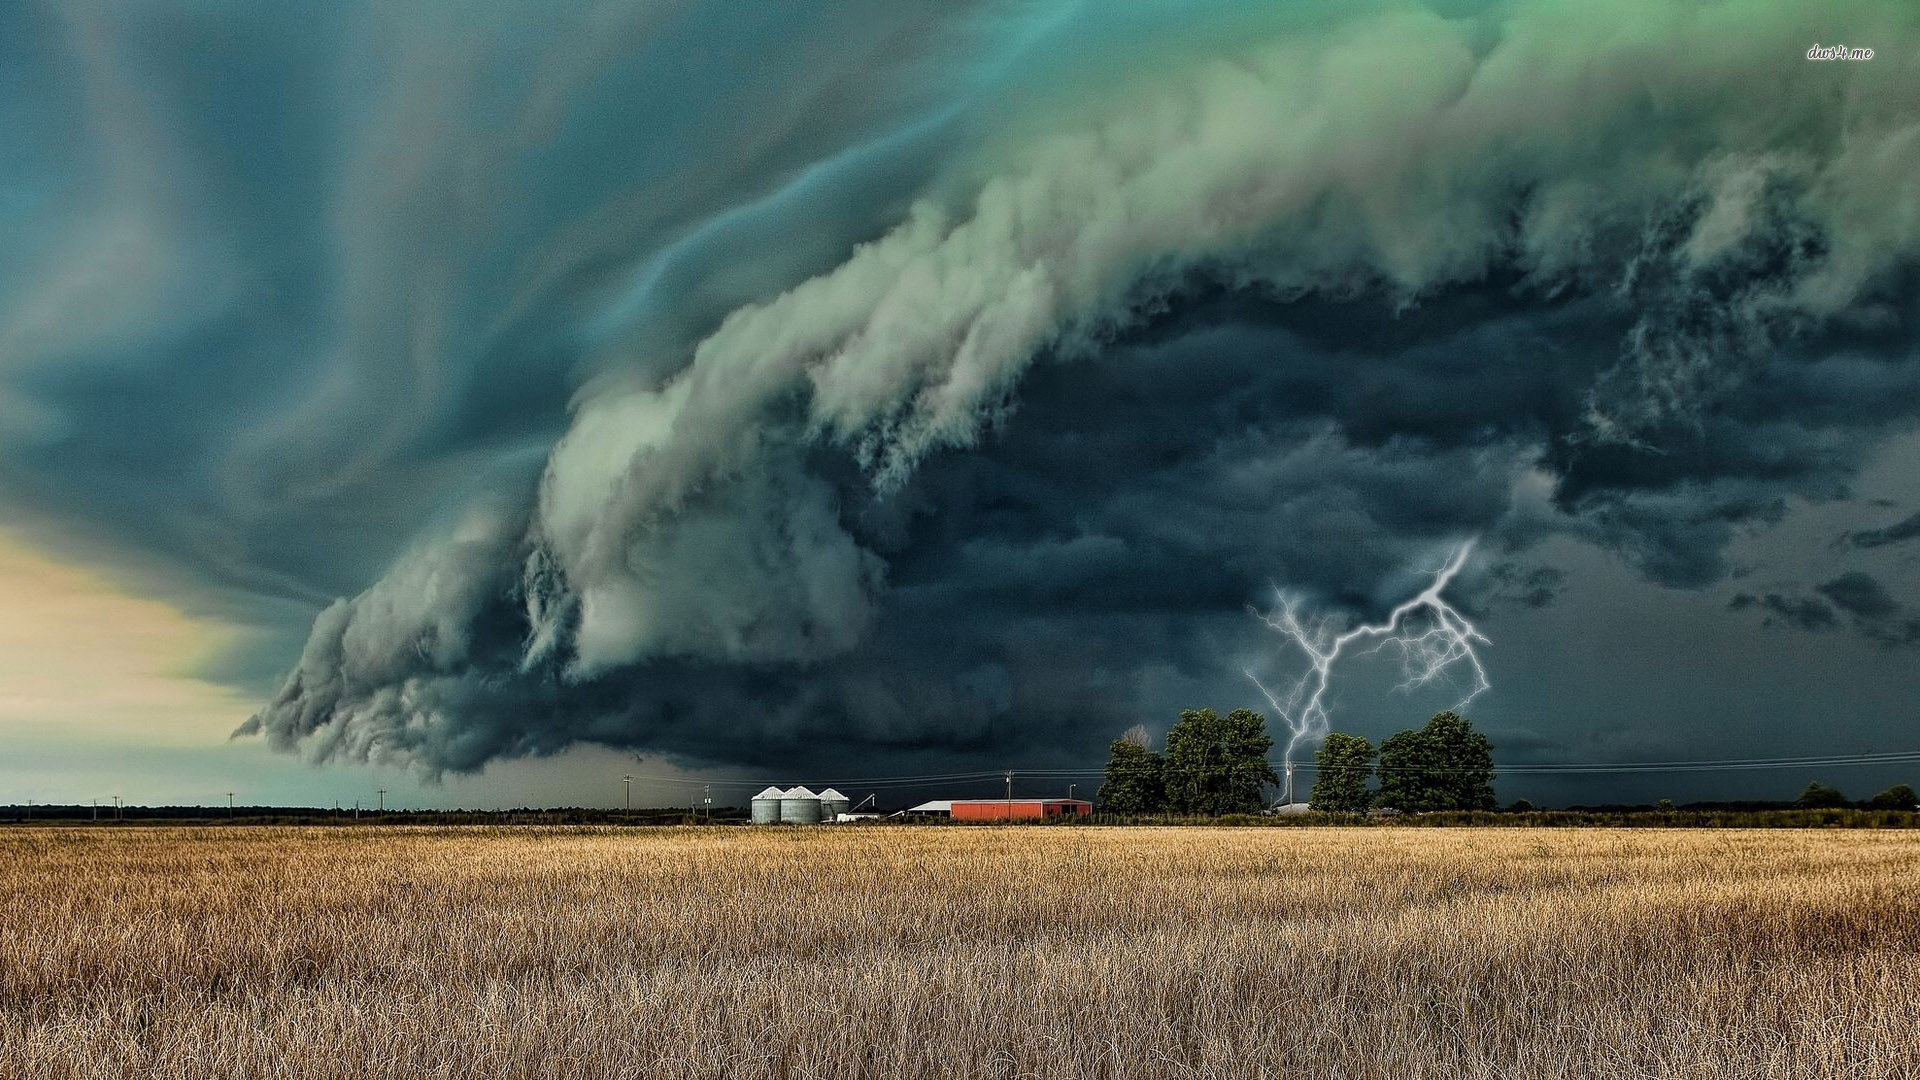 storm cloud desktop wallpaper 49 images